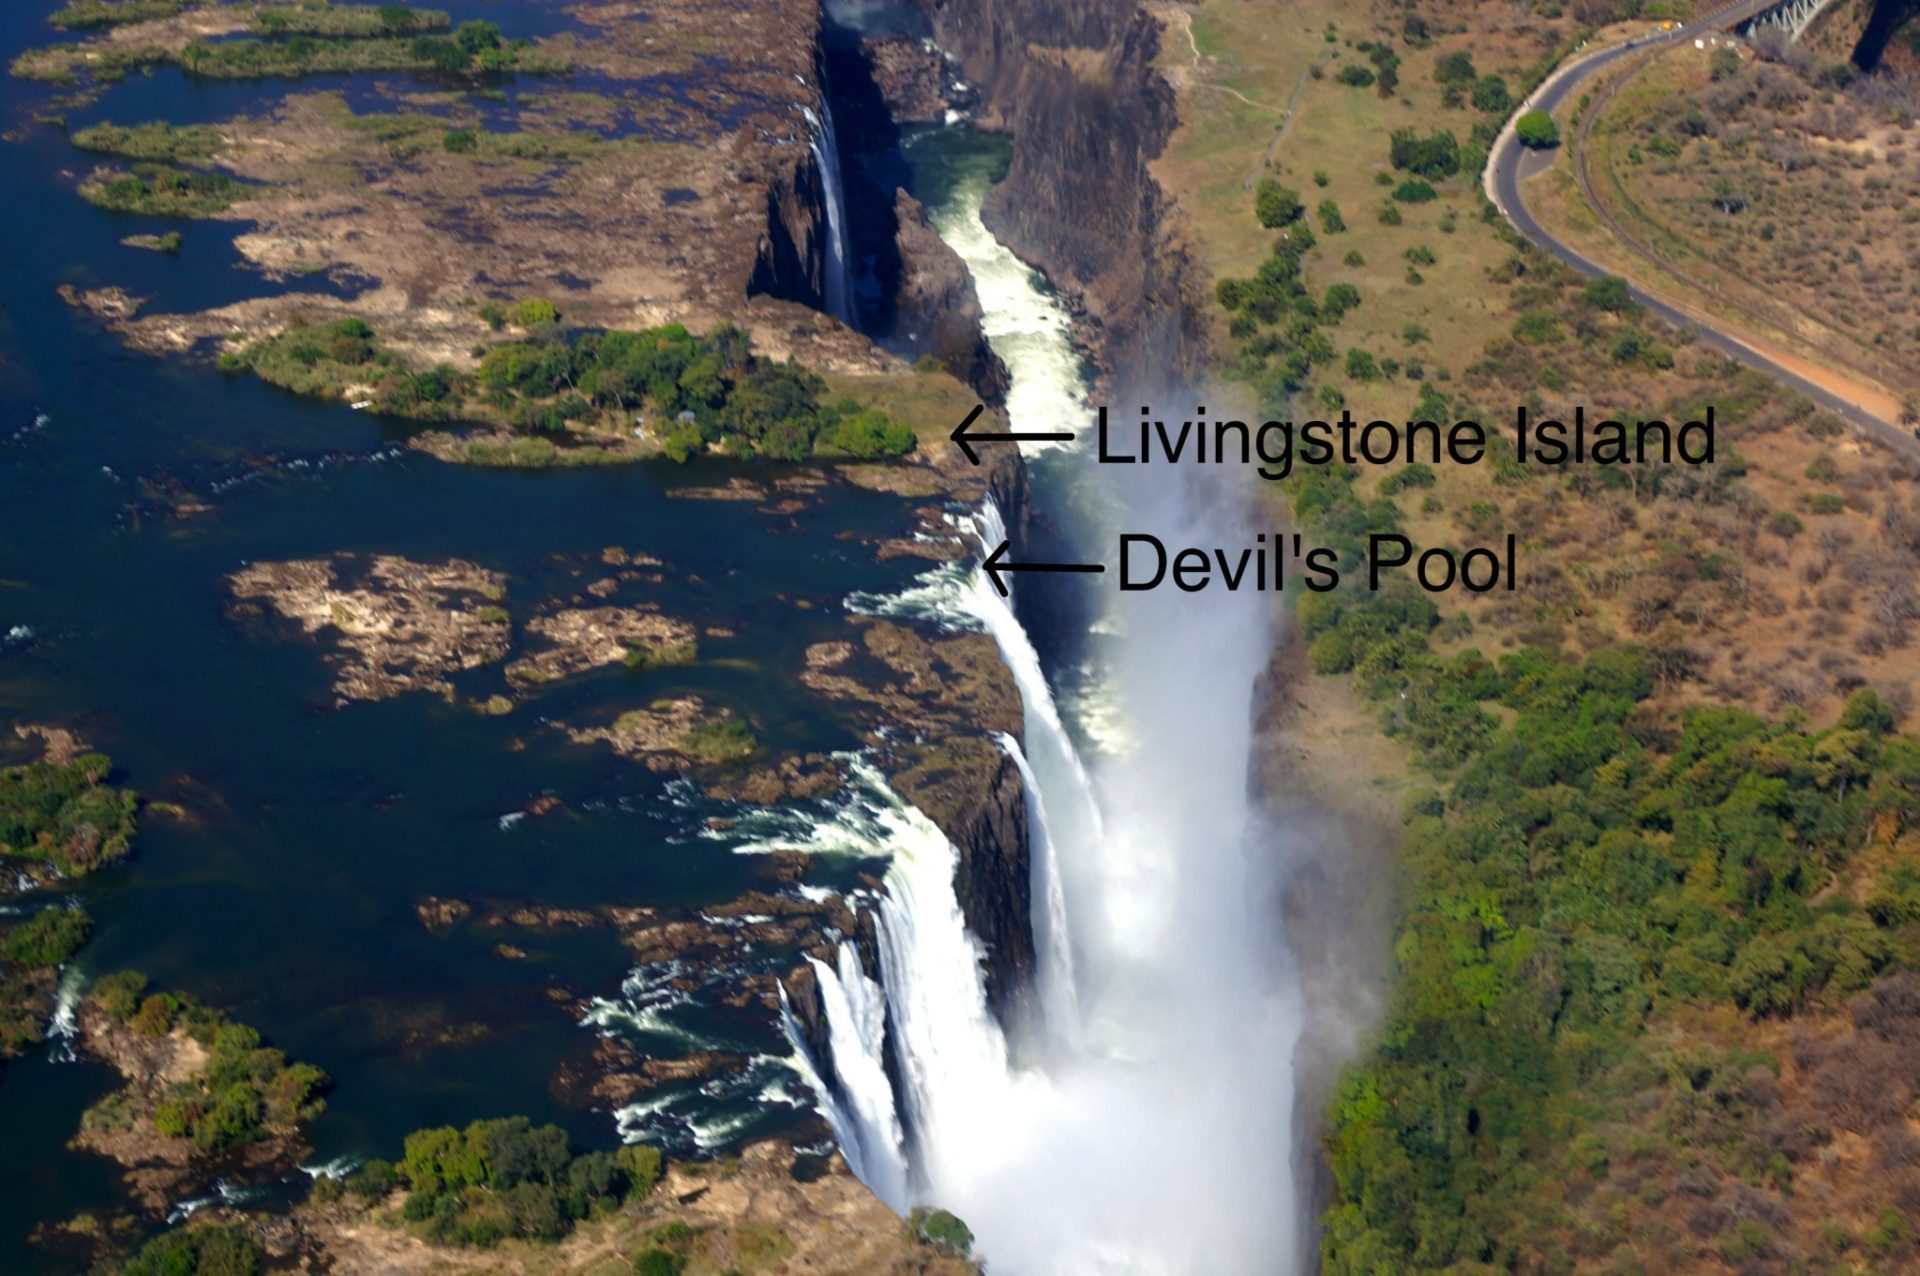 victoria falls zimbabwe devils swimming pool - Latest